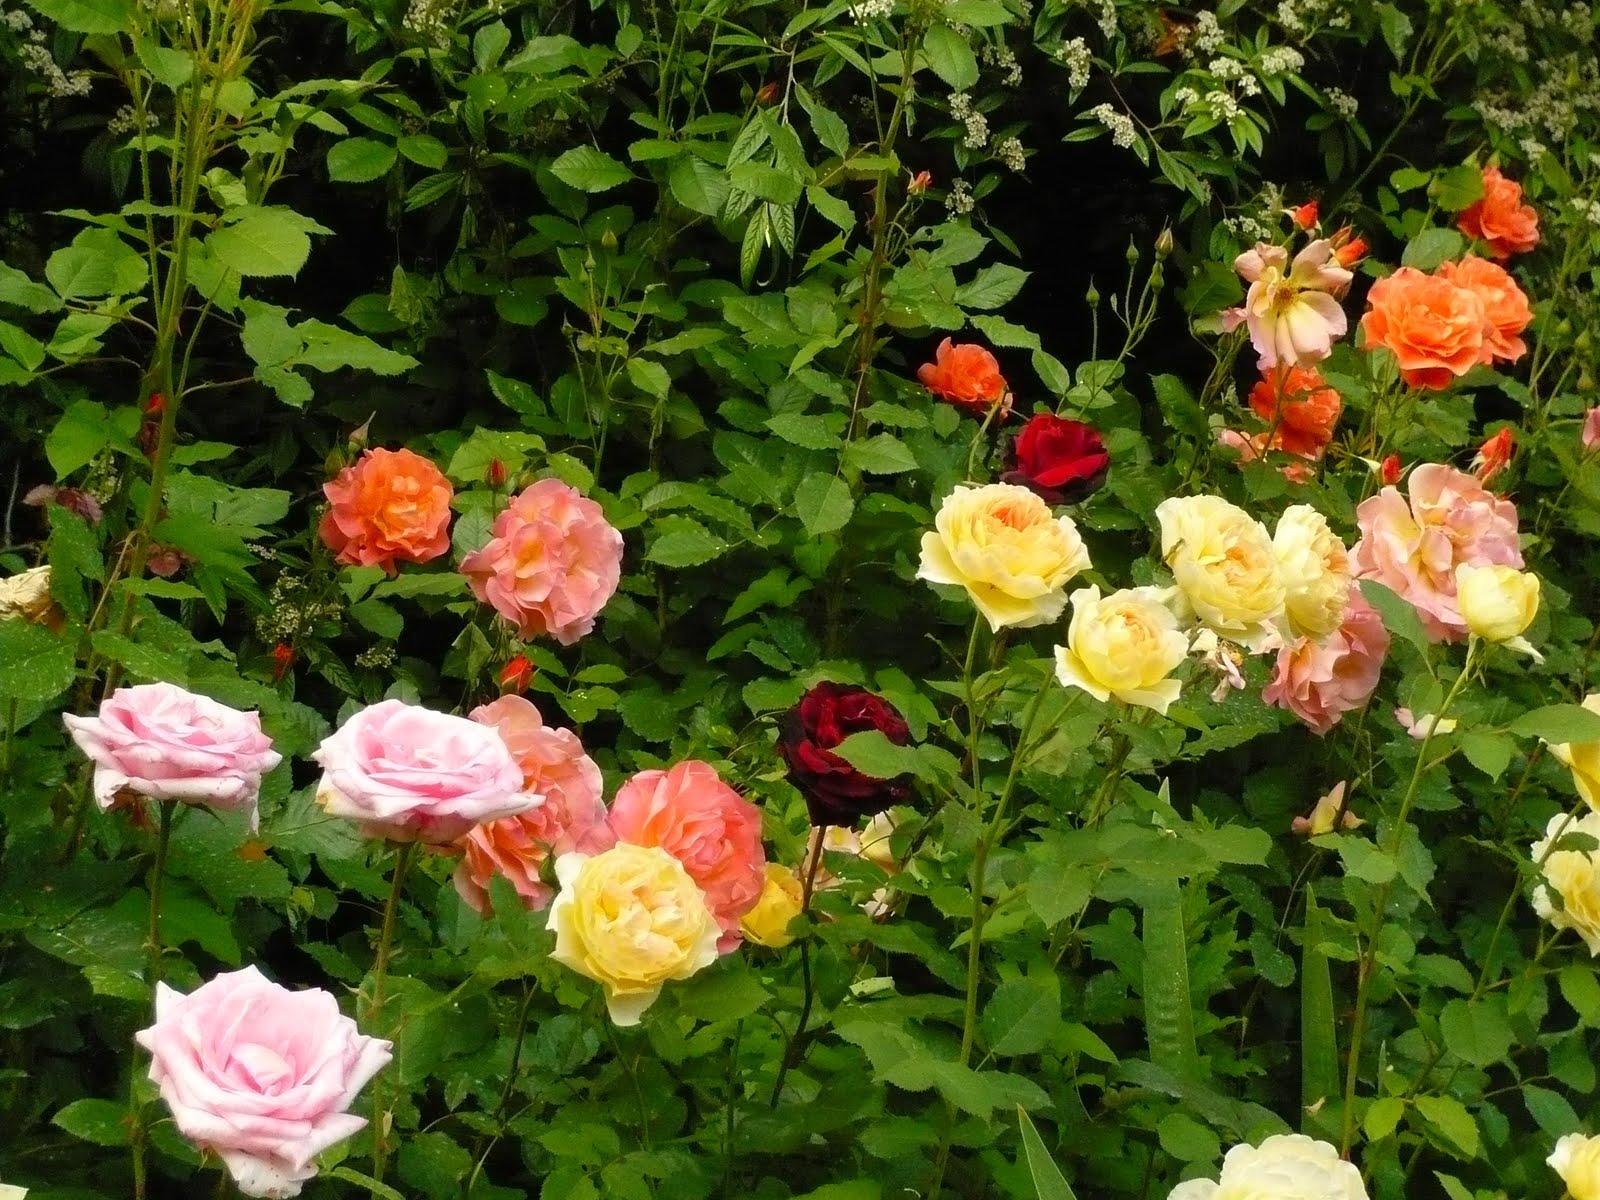 Jardines de rosas imagui - Jardines con rosas ...